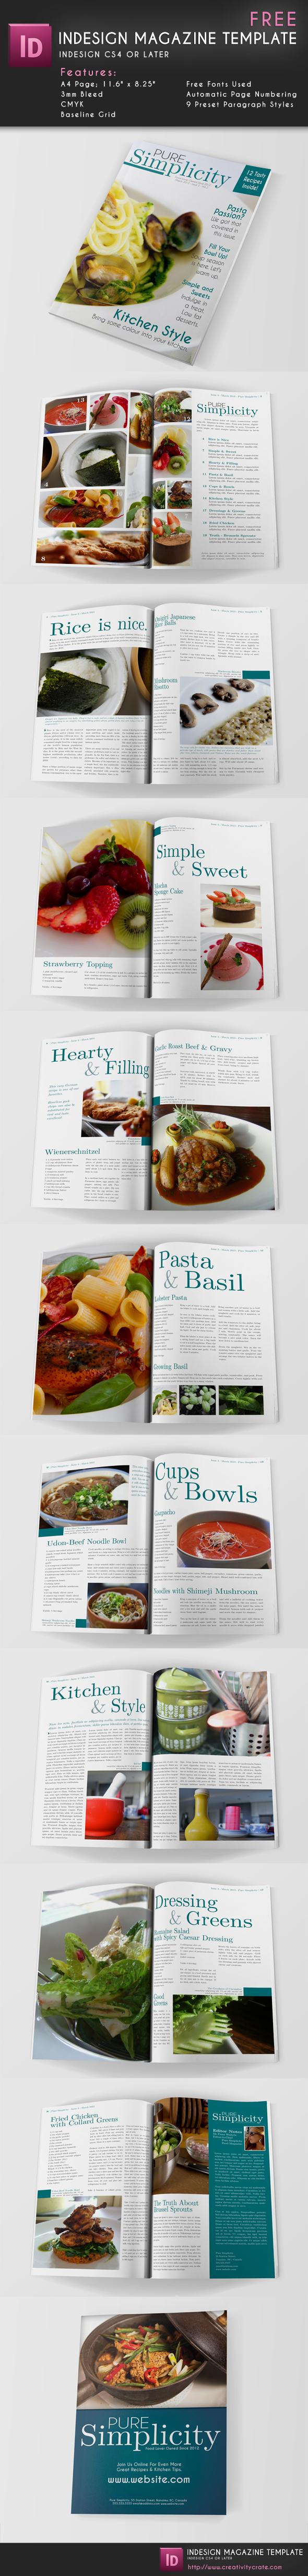 Magazine Template Indesign FREE | Design | Pinterest | Revistas